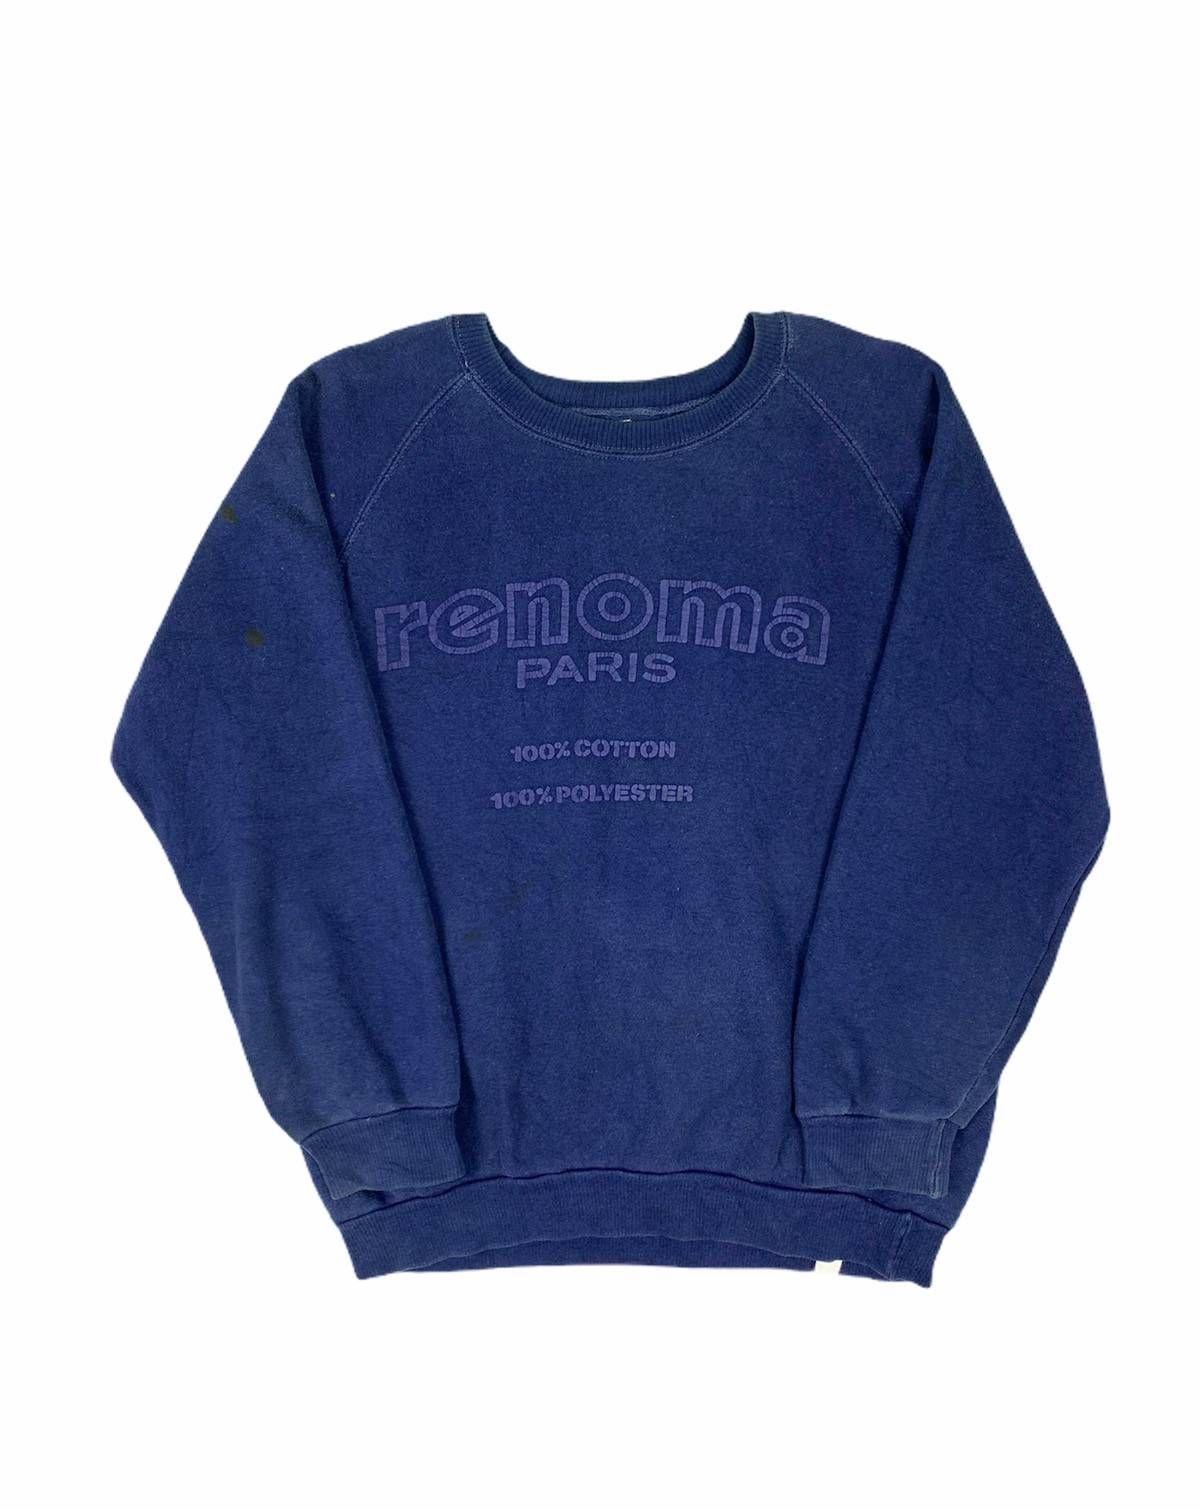 Luxury Paris Renoma Renoma Paris Big Logo Vintage Thick Coton Crewneck Sweatshirt Size M 135 Sweatshirts Crew Neck Sweatshirt Vintage Logo [ 1510 x 1200 Pixel ]